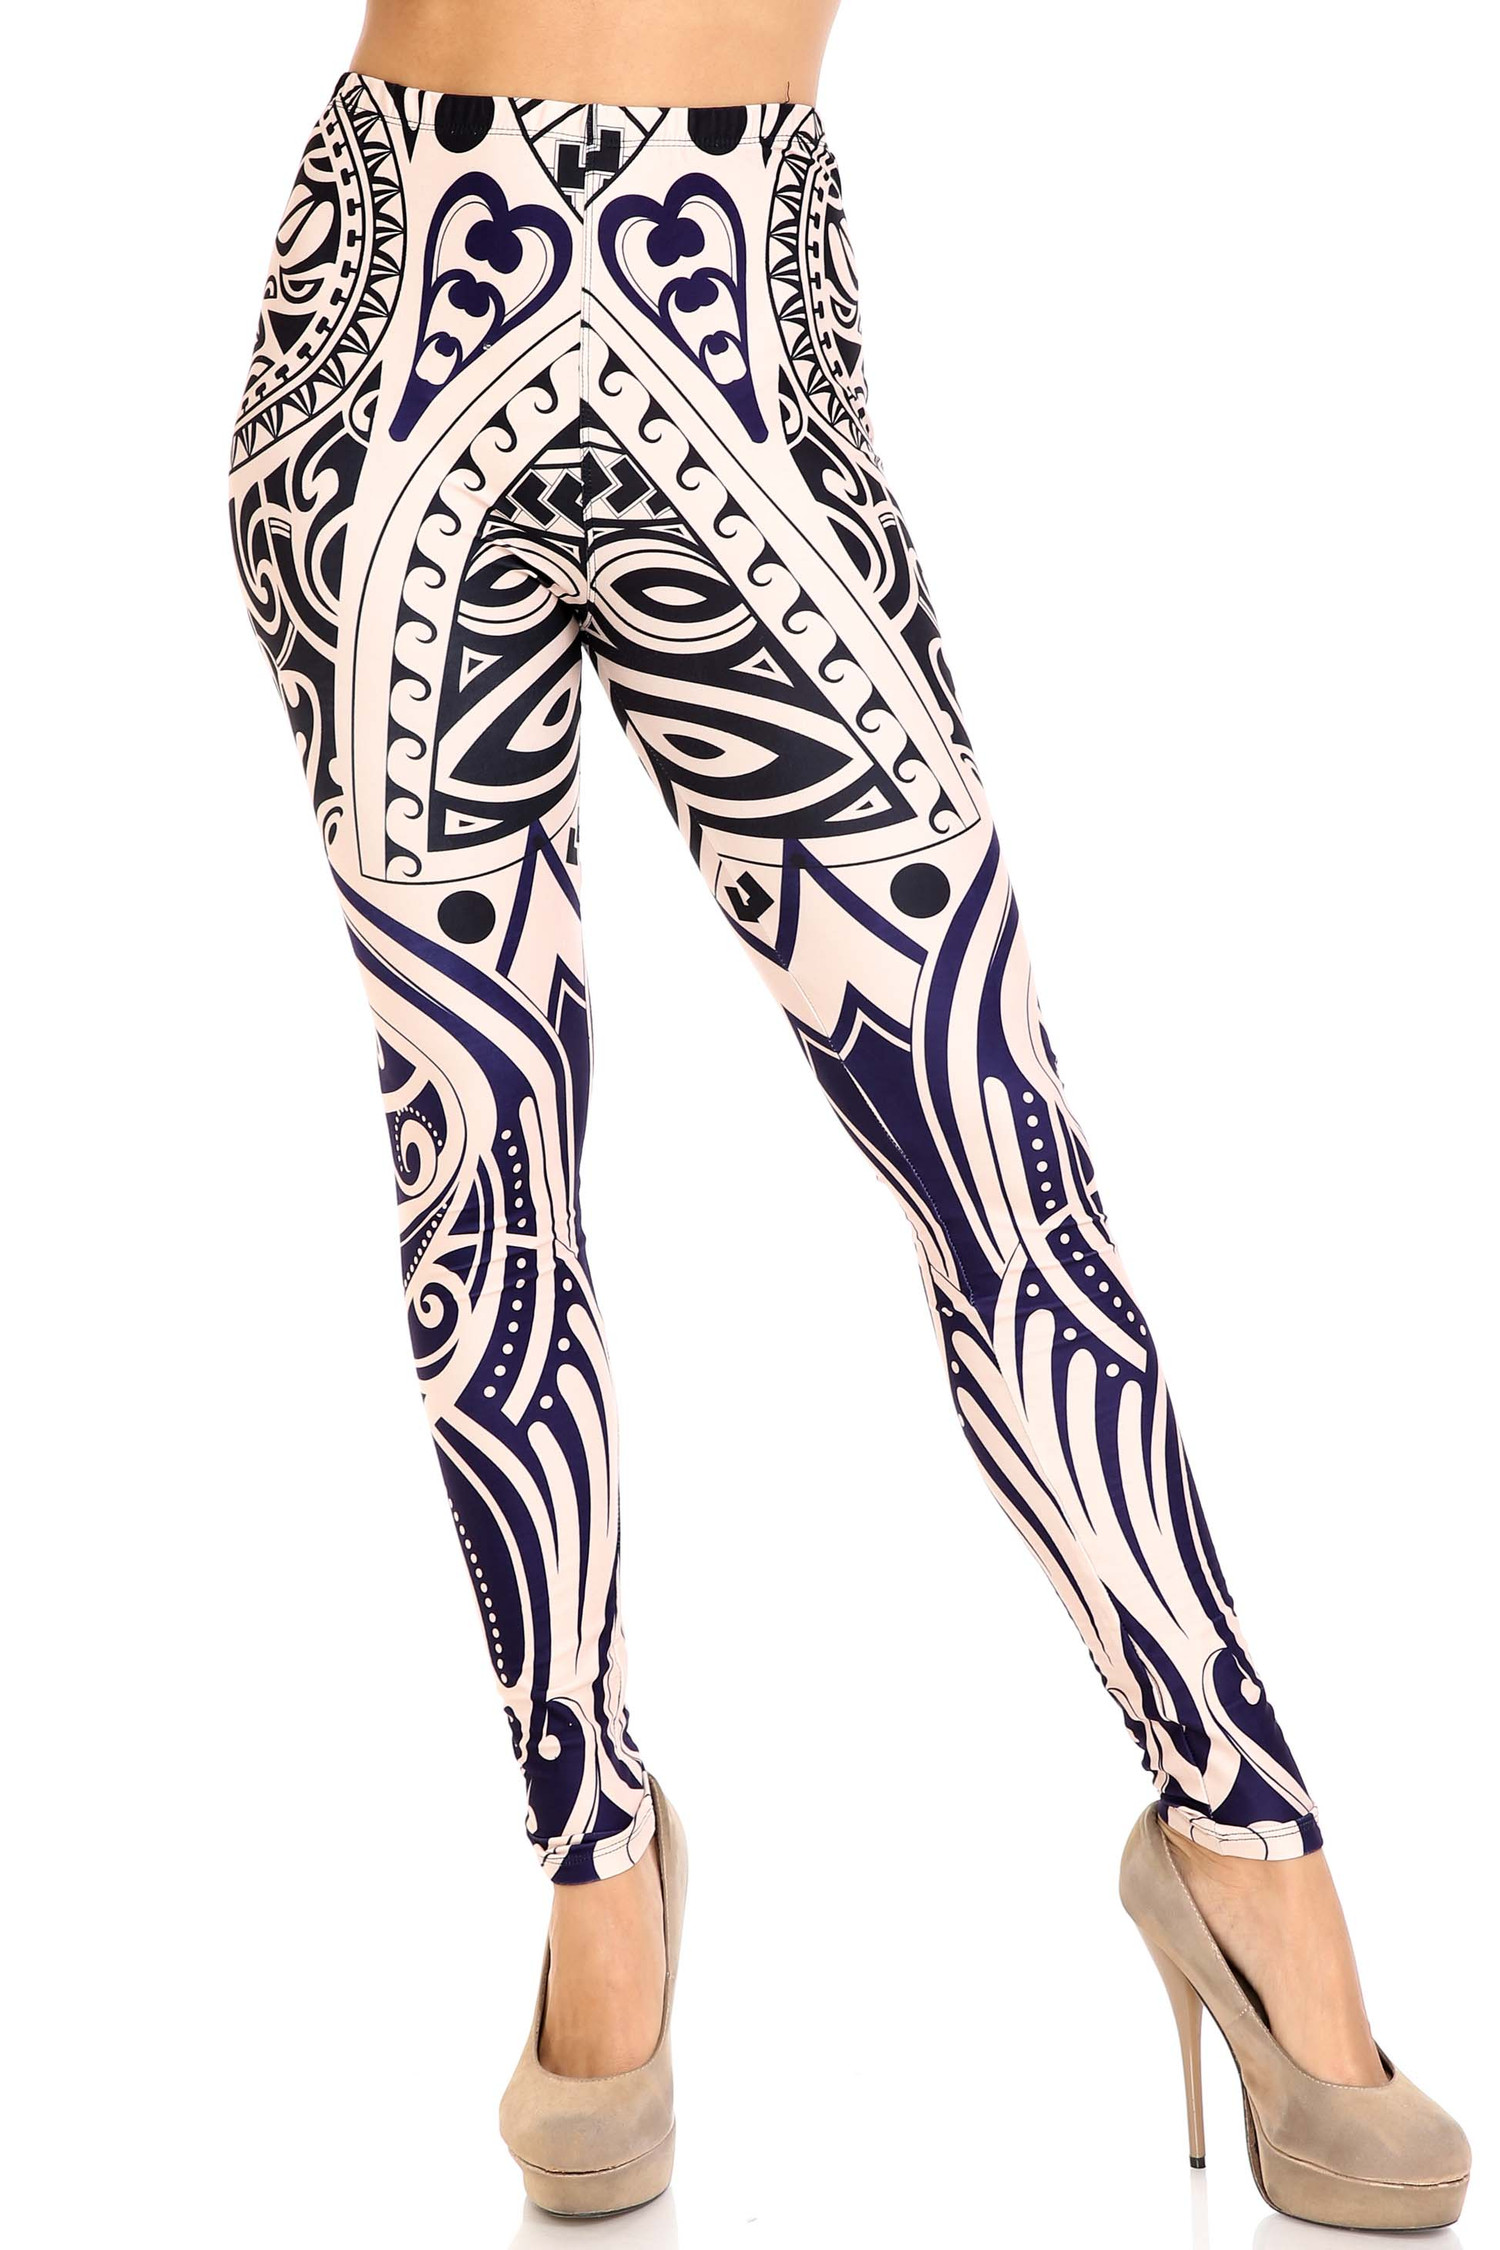 Front side image of Creamy Soft Valhalla Extra Plus Size Leggings - 3X-5X - USA Fashion™